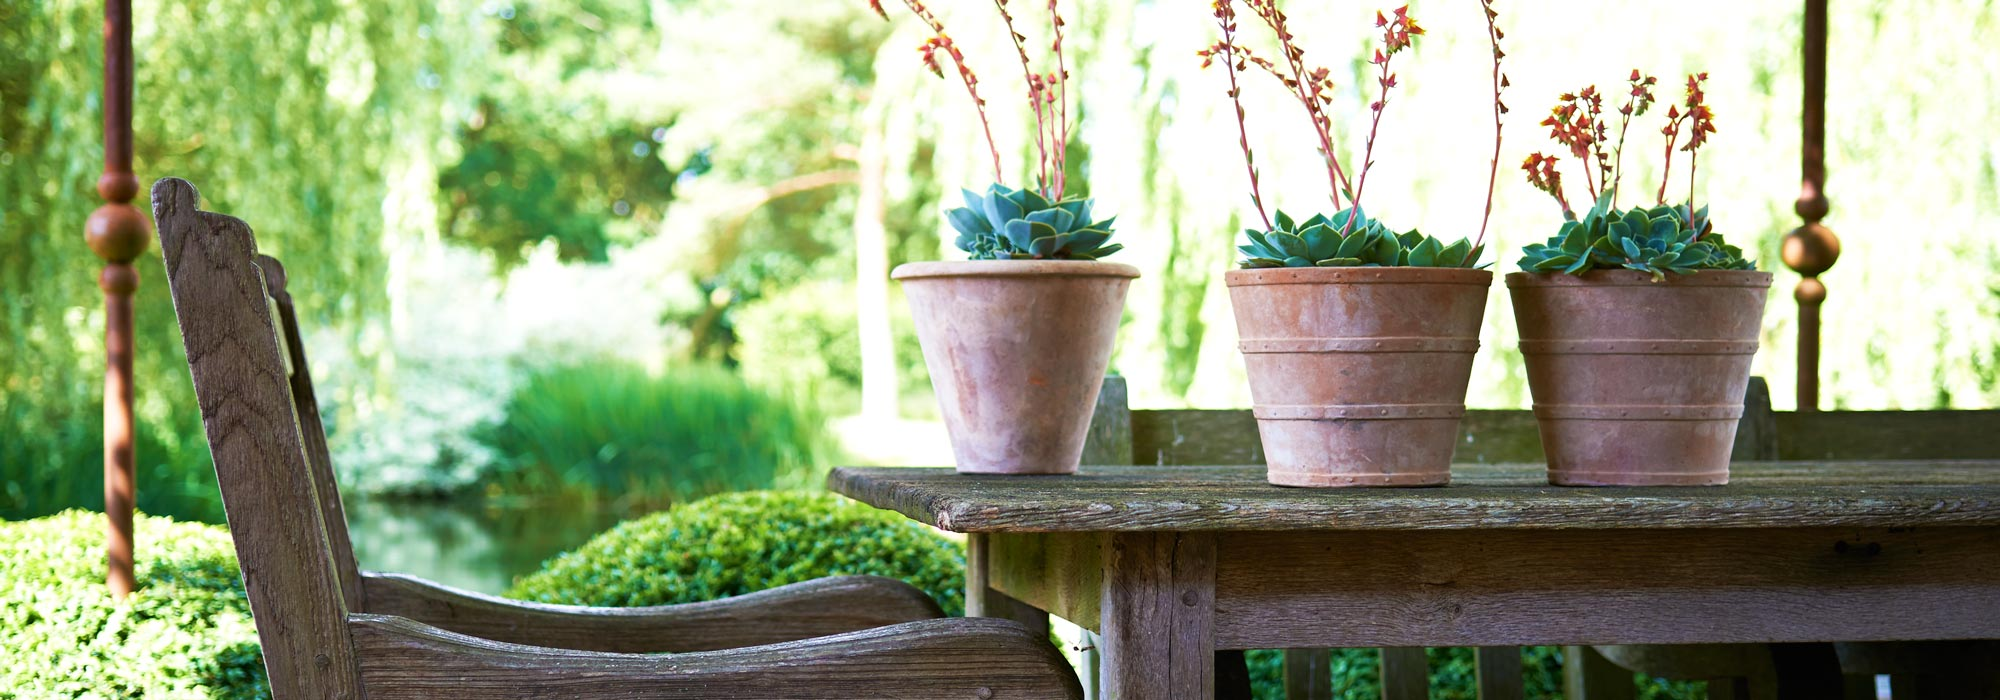 Italian Terrace large terracotta pots